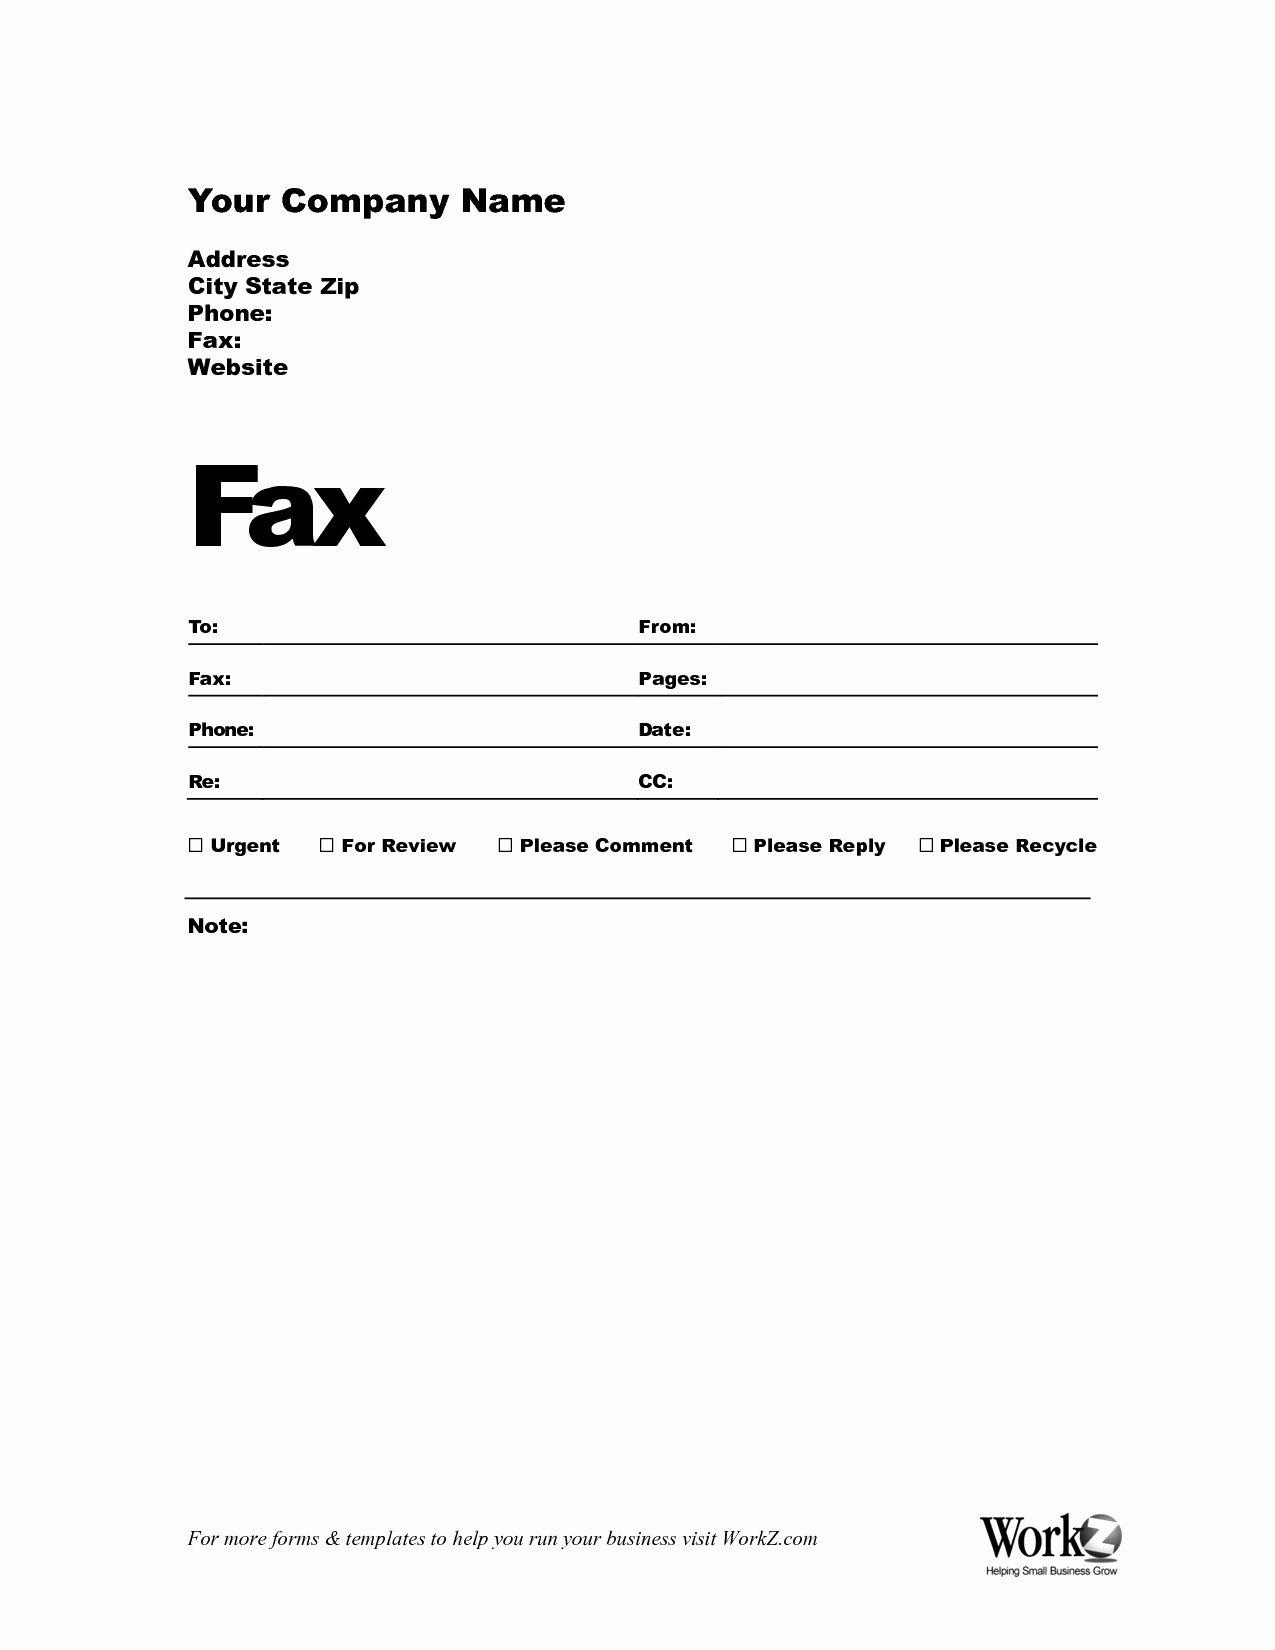 Professional Fax Cover Sheet Pdf Elegant Download 57 Fax Cover Page - Free Printable Fax Cover Sheet Pdf